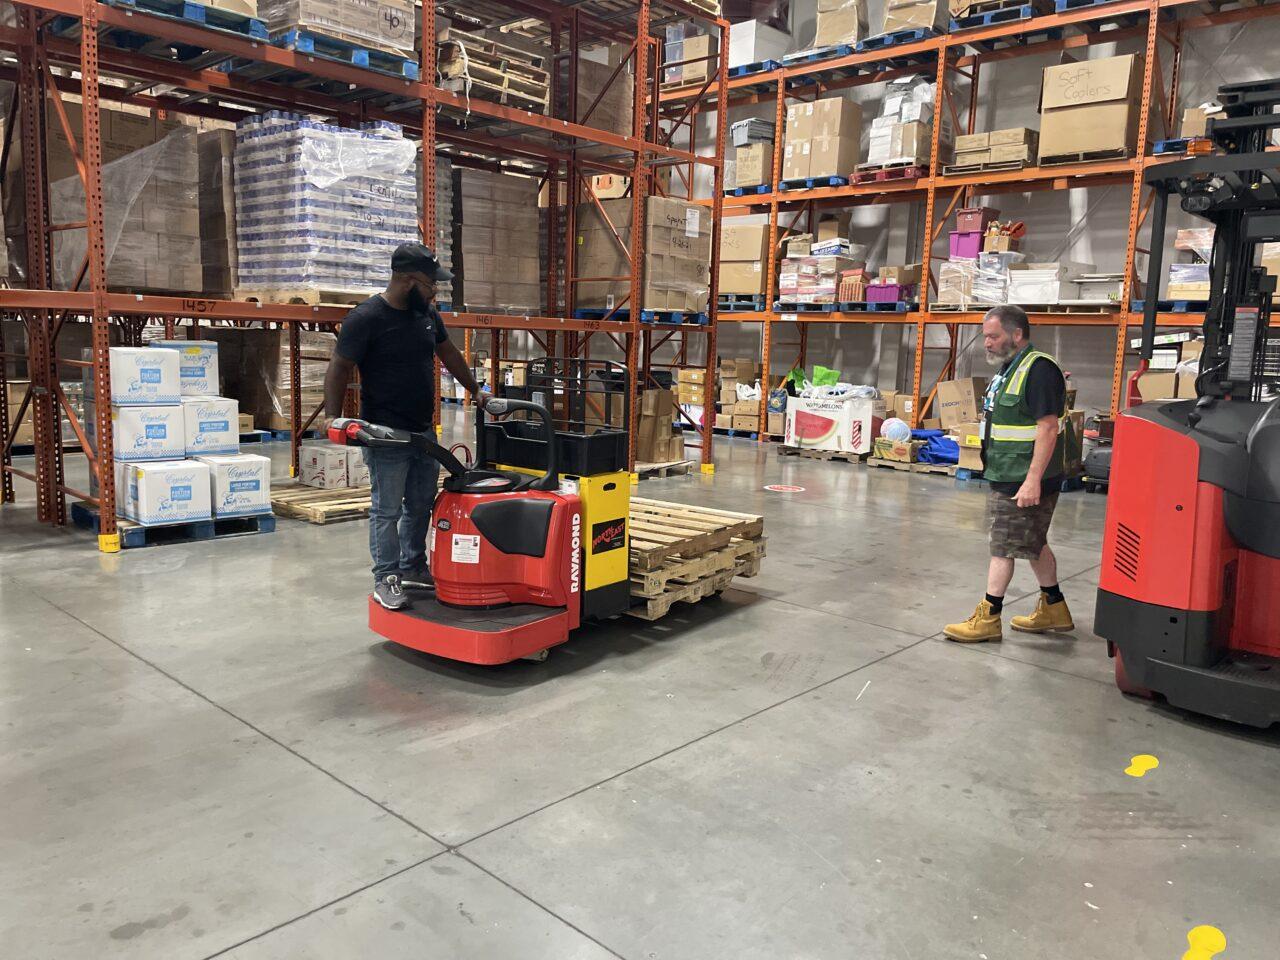 Free warehousing/ logistics training!